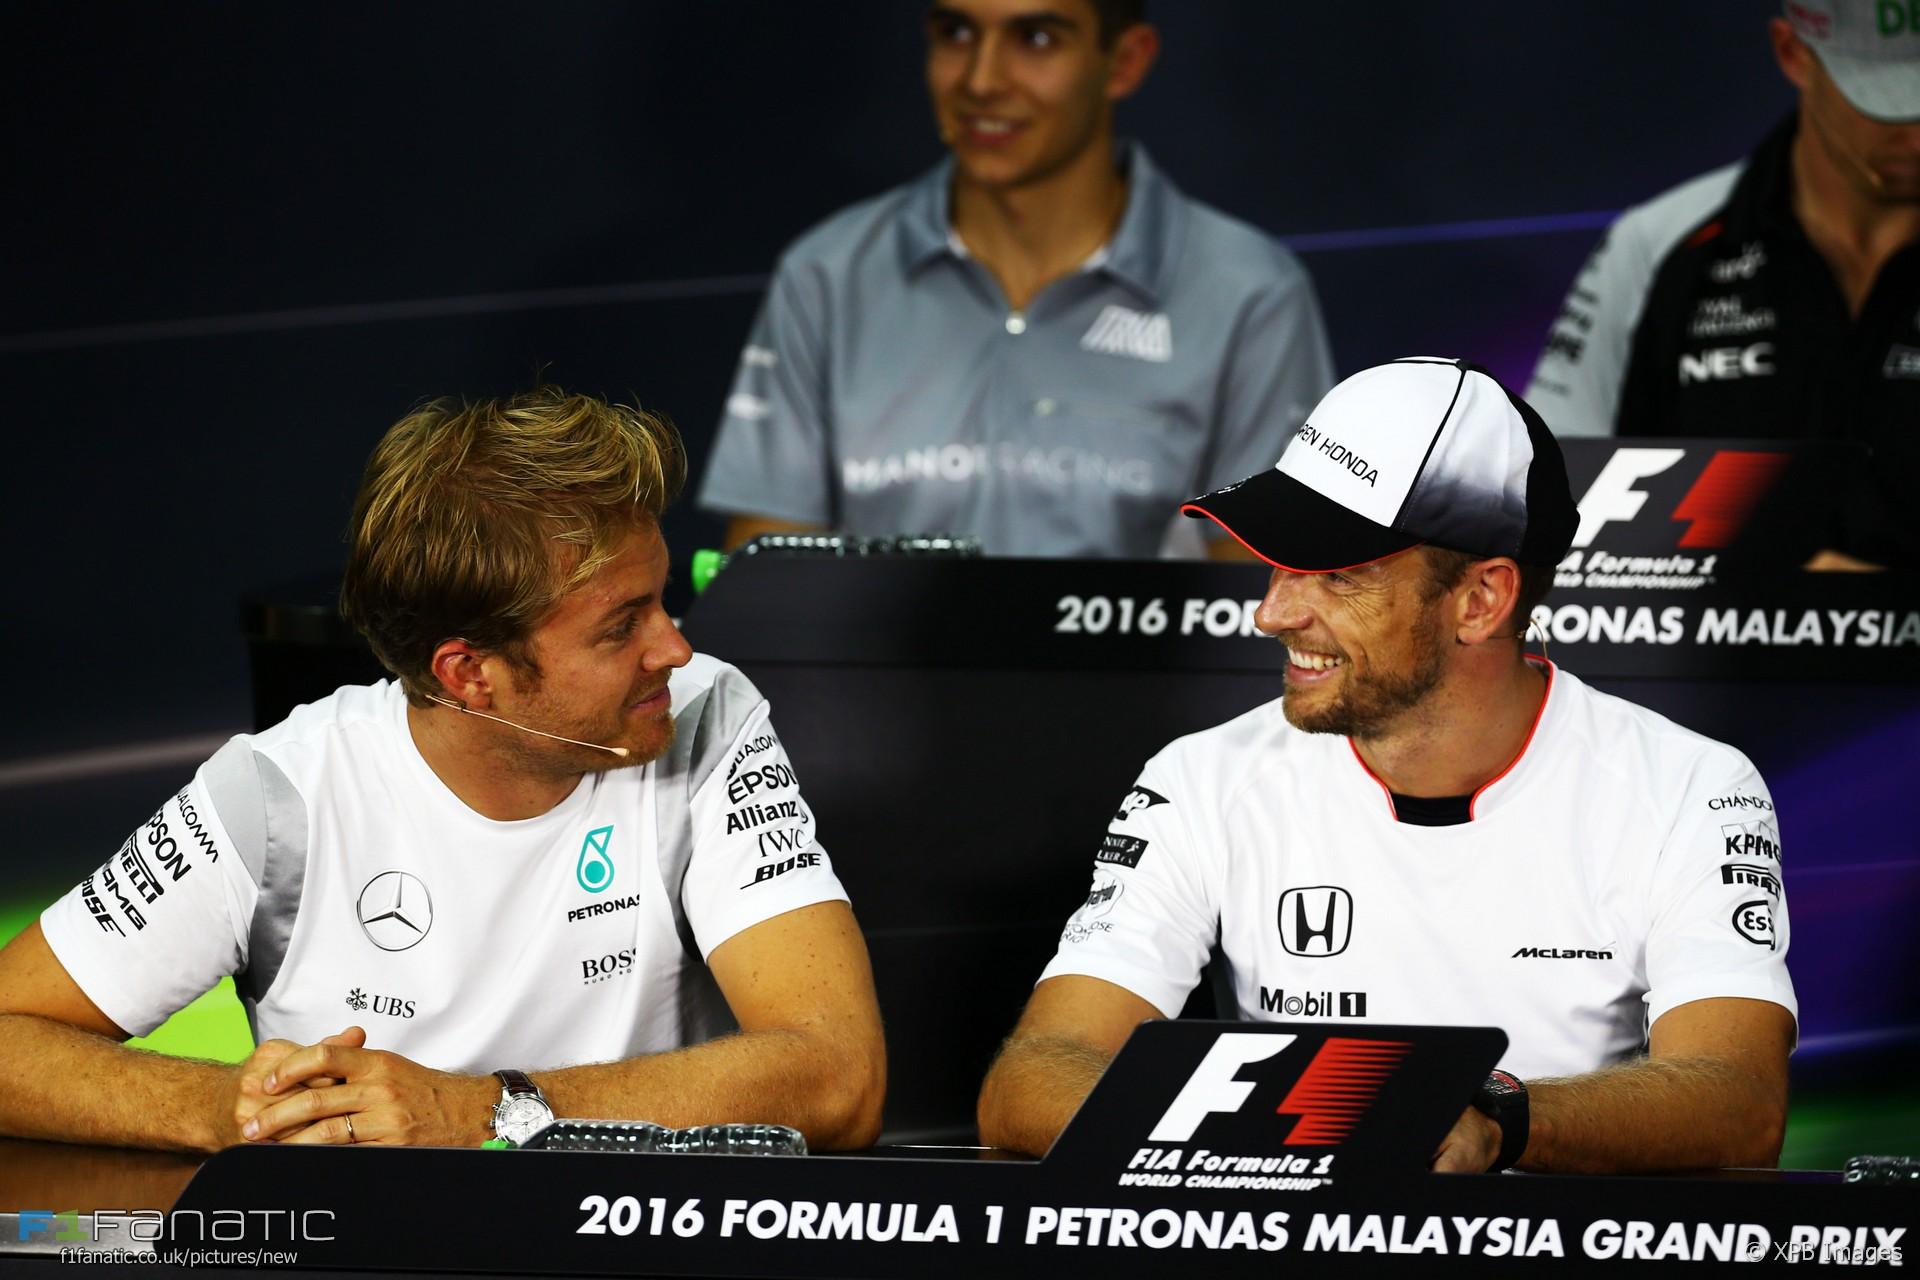 Nico Rosberg, Jenson Button, Sepang International Circuit, 2016